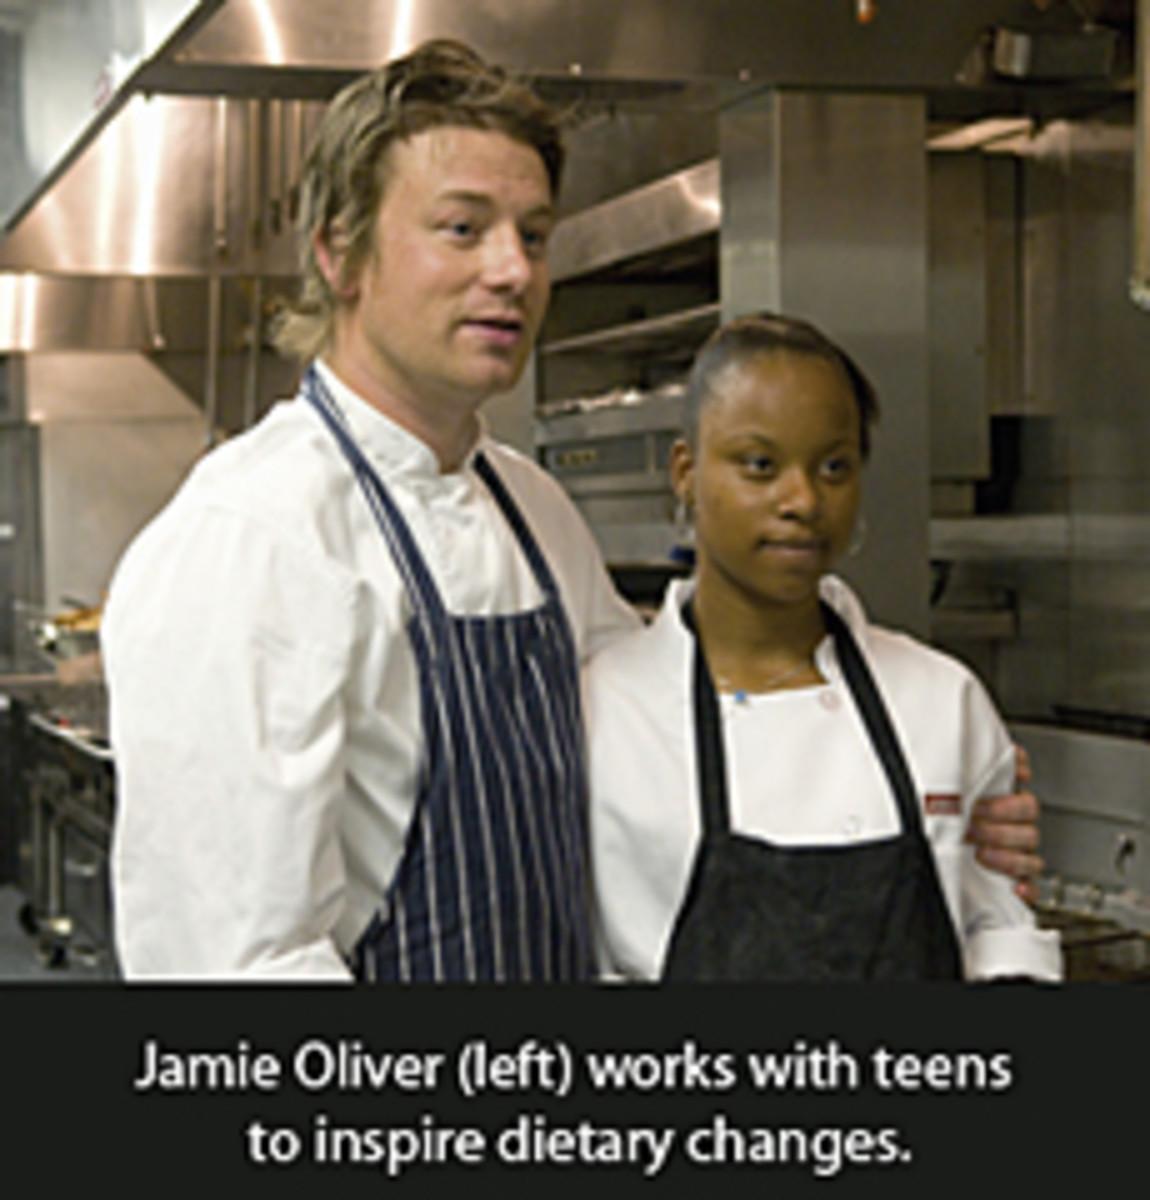 JAMIE OLIVER, EMILY HILL